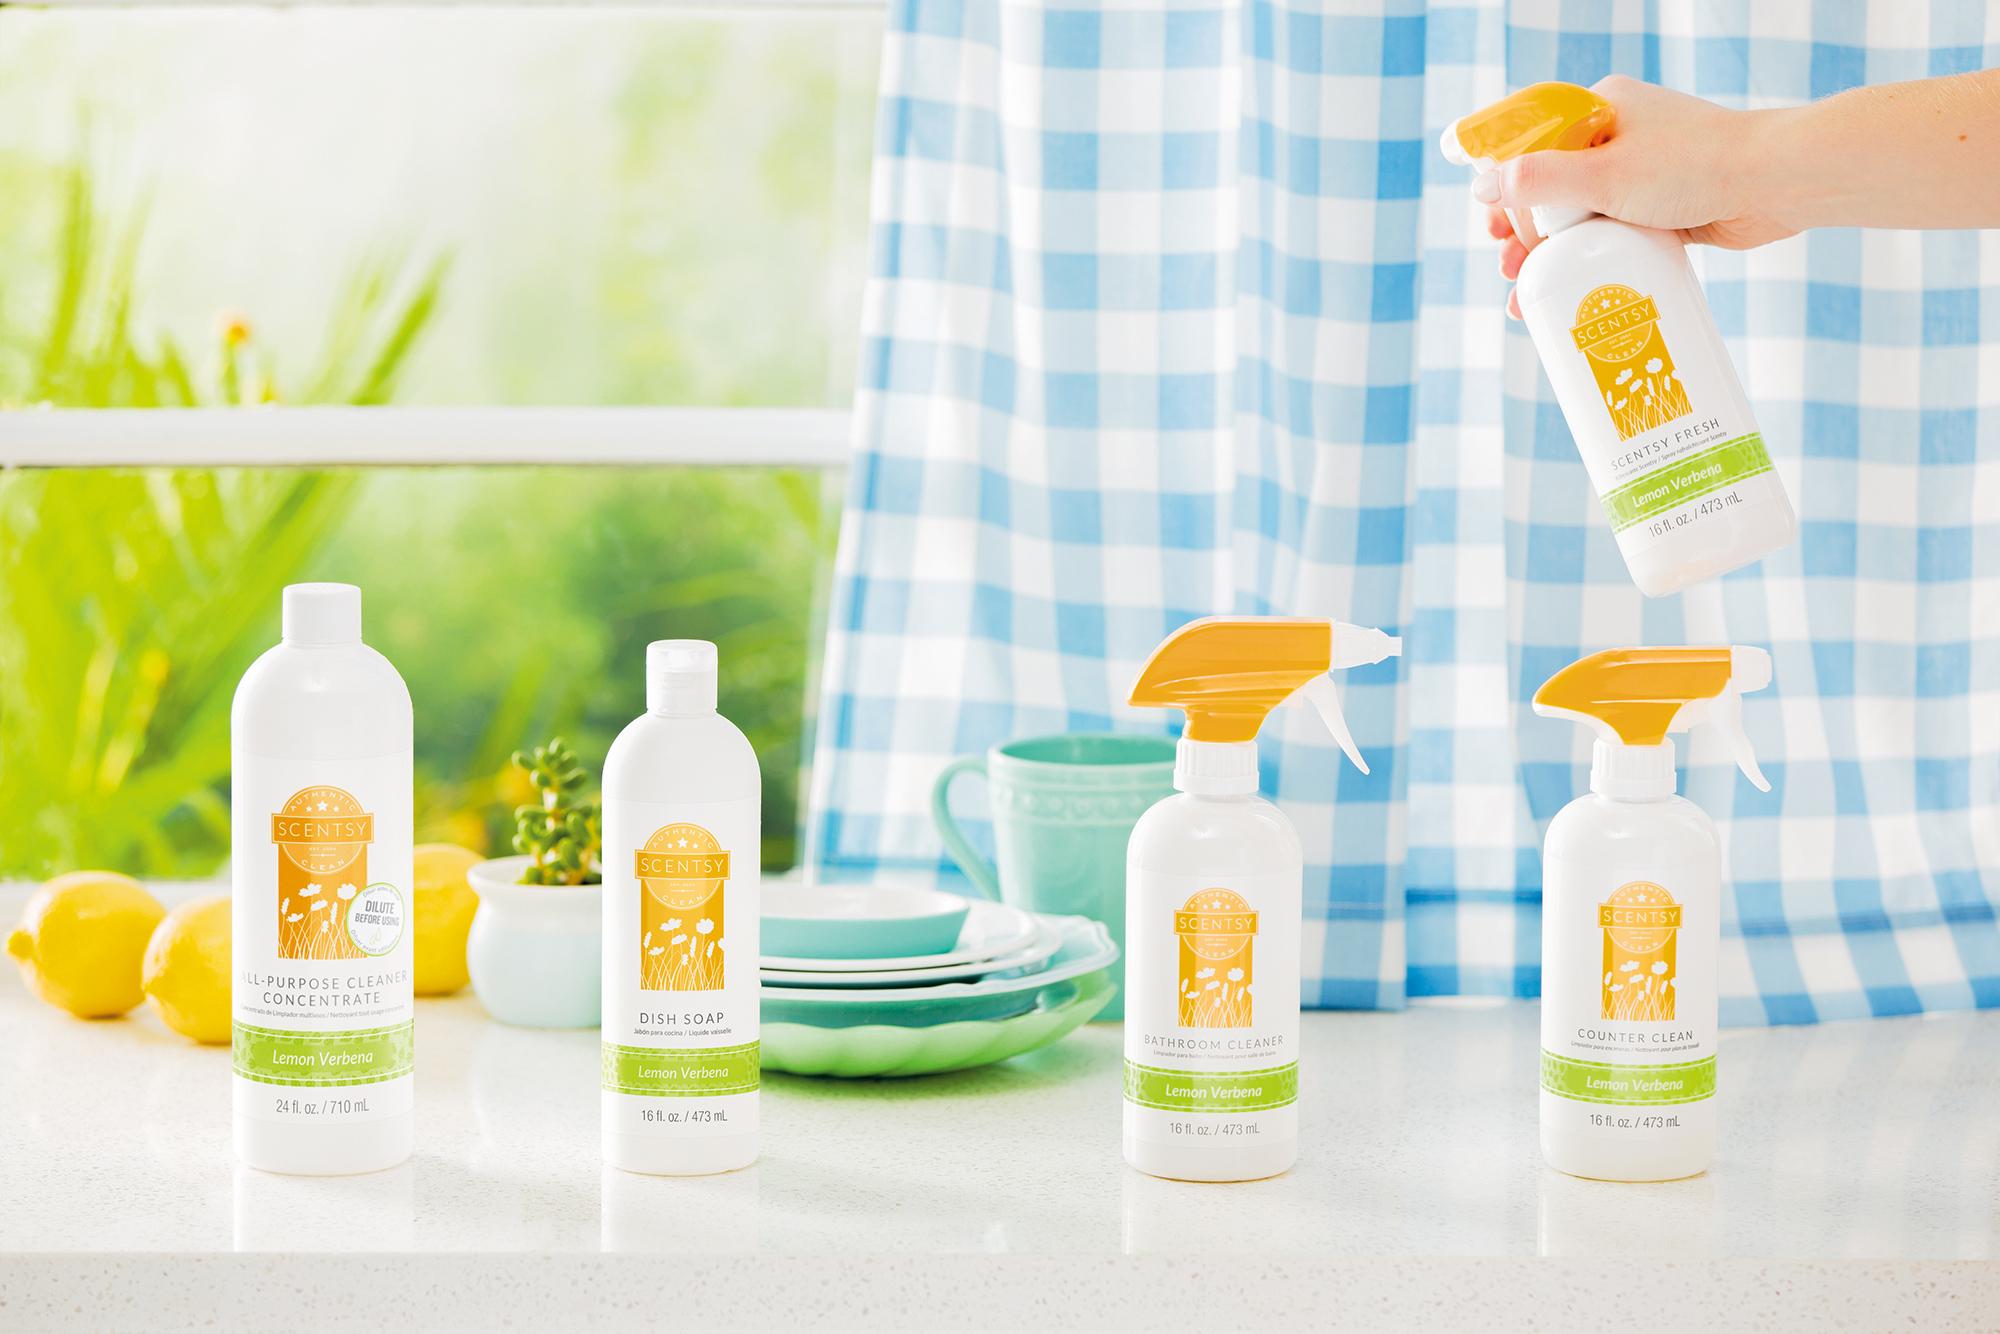 Lemon Verbena Scentsy Clean products